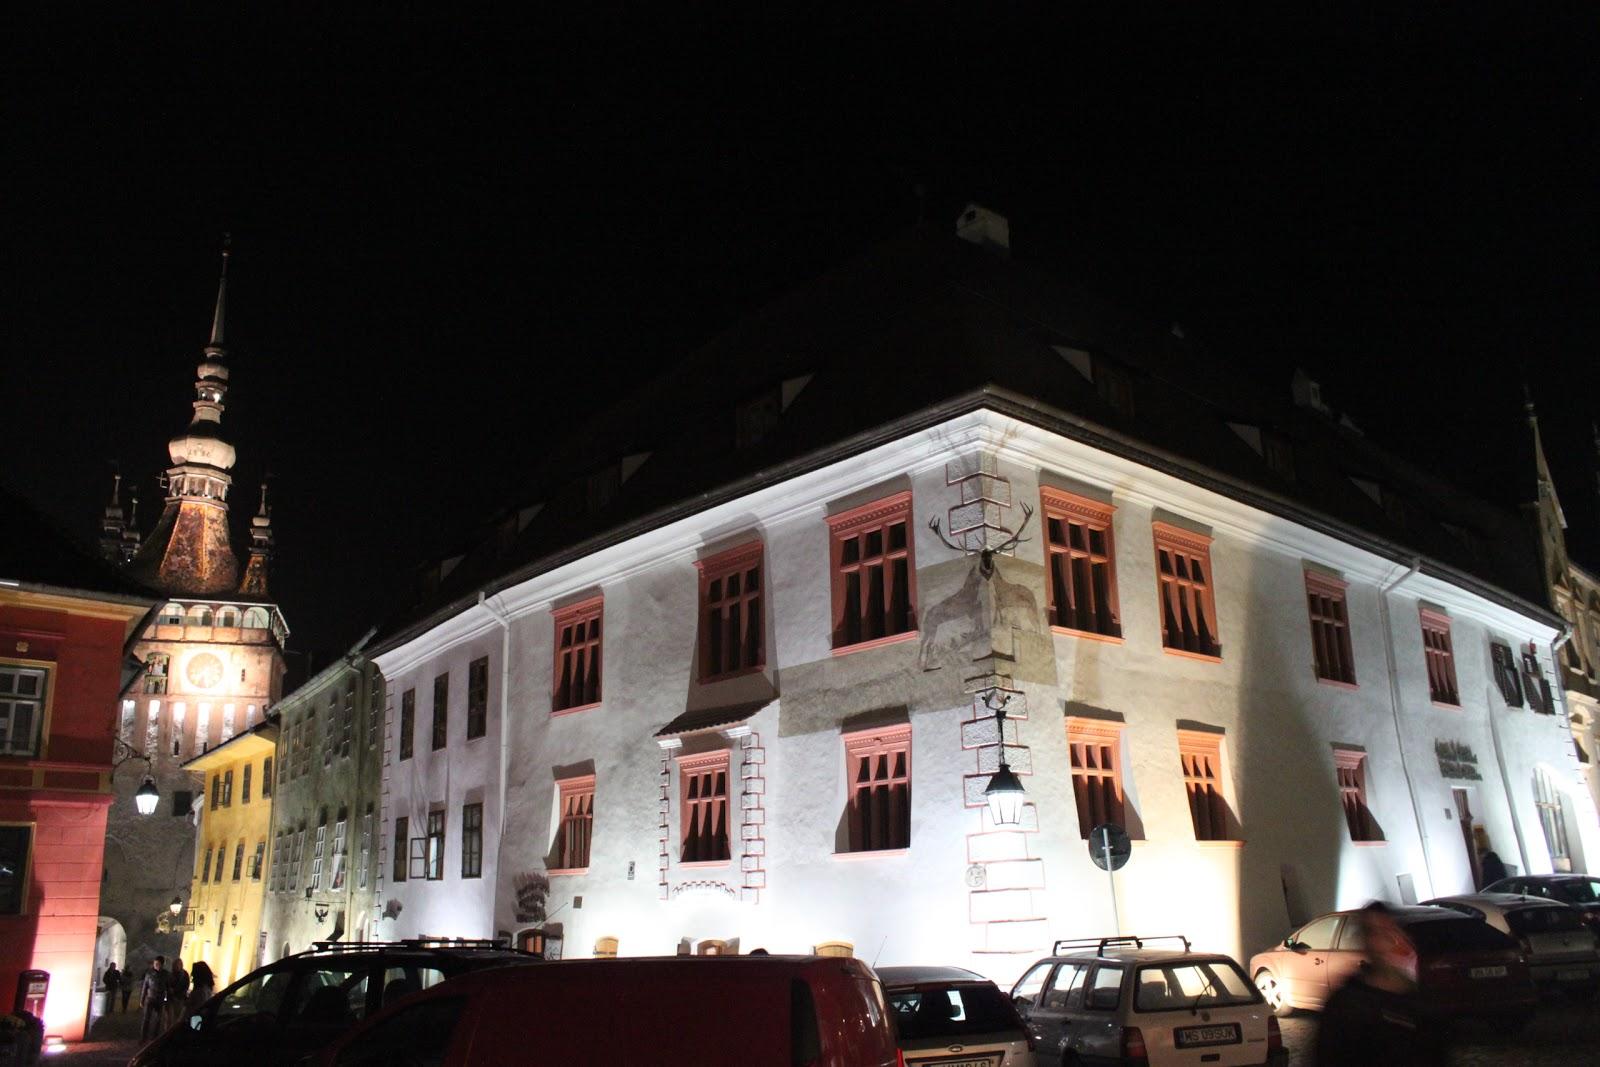 El dadaista gastronmico Comida Tradicional Rumana  Casa cu Cerb Sighisoara